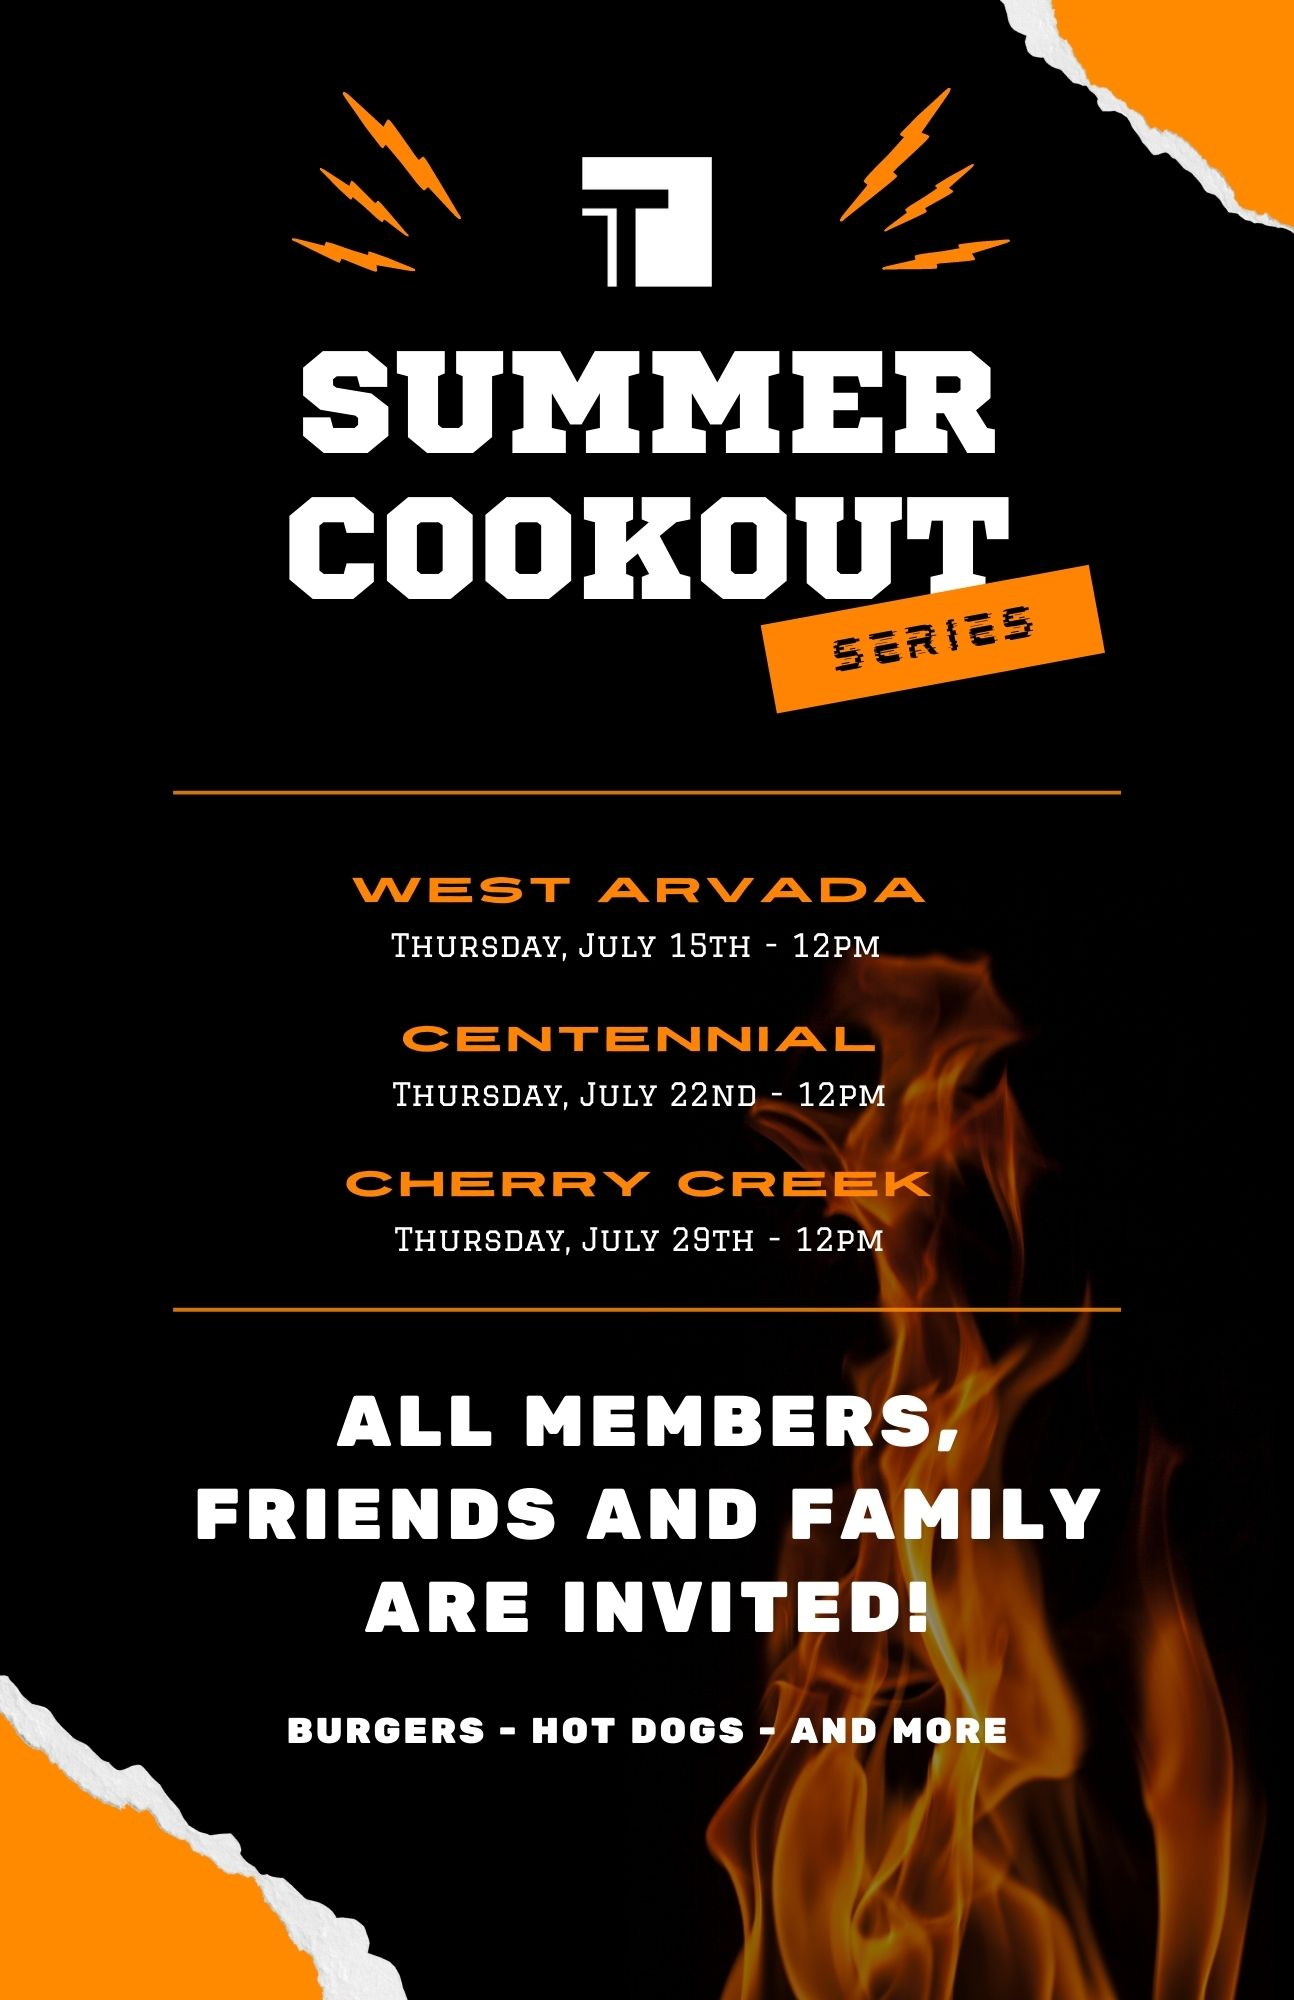 Summer Cookout Series Poste